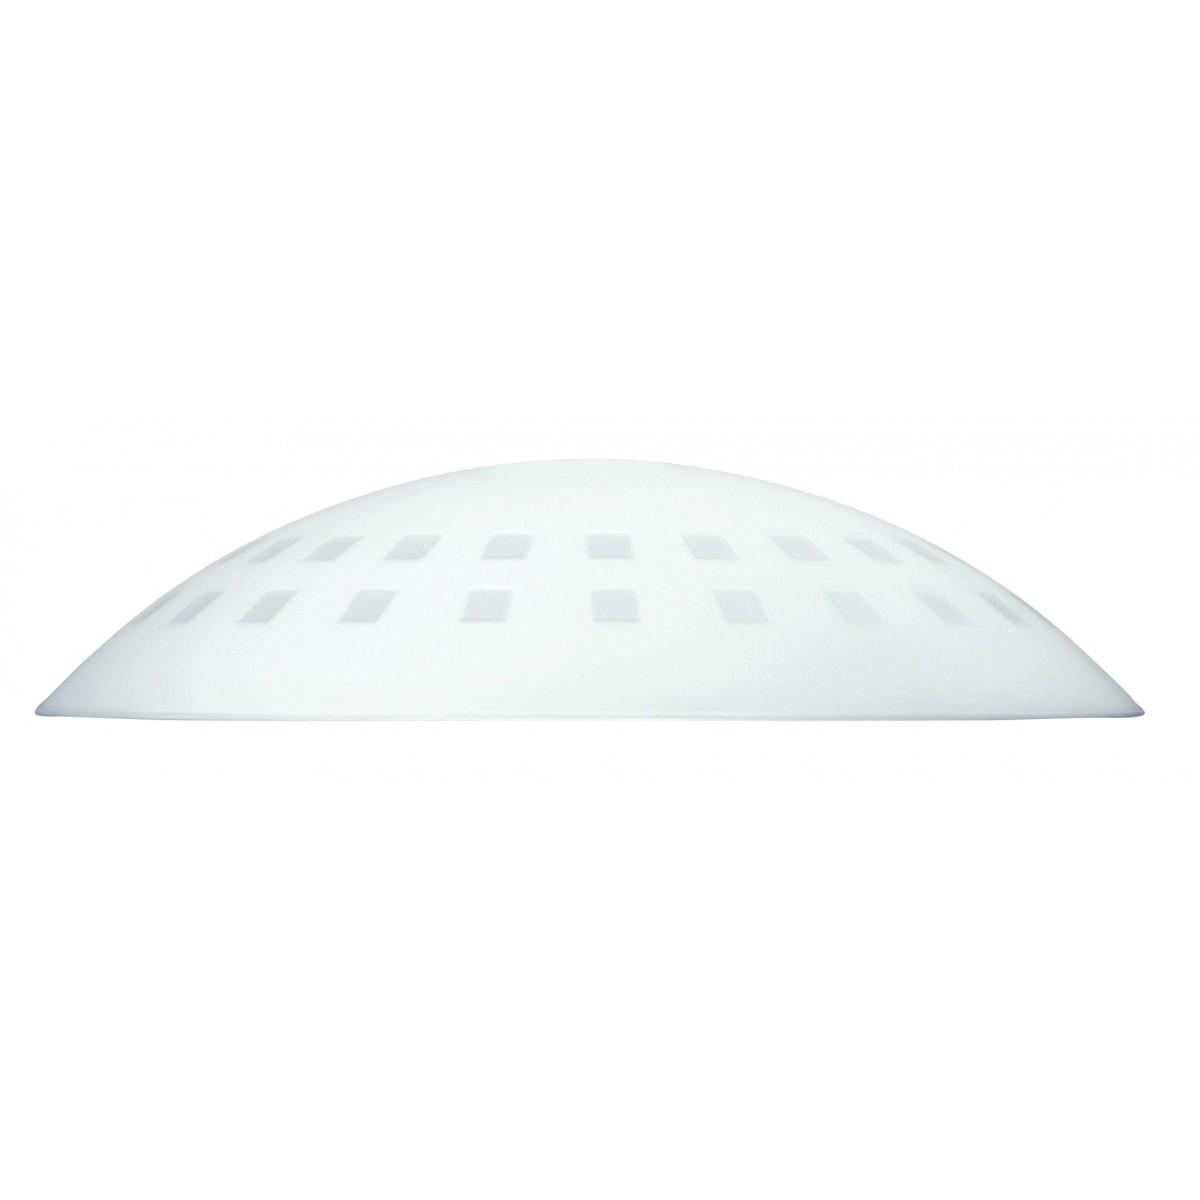 I-V00042400024 - Paralume per Sospensione Vetro Bianco Fori Quadrati 42x10 cm F42